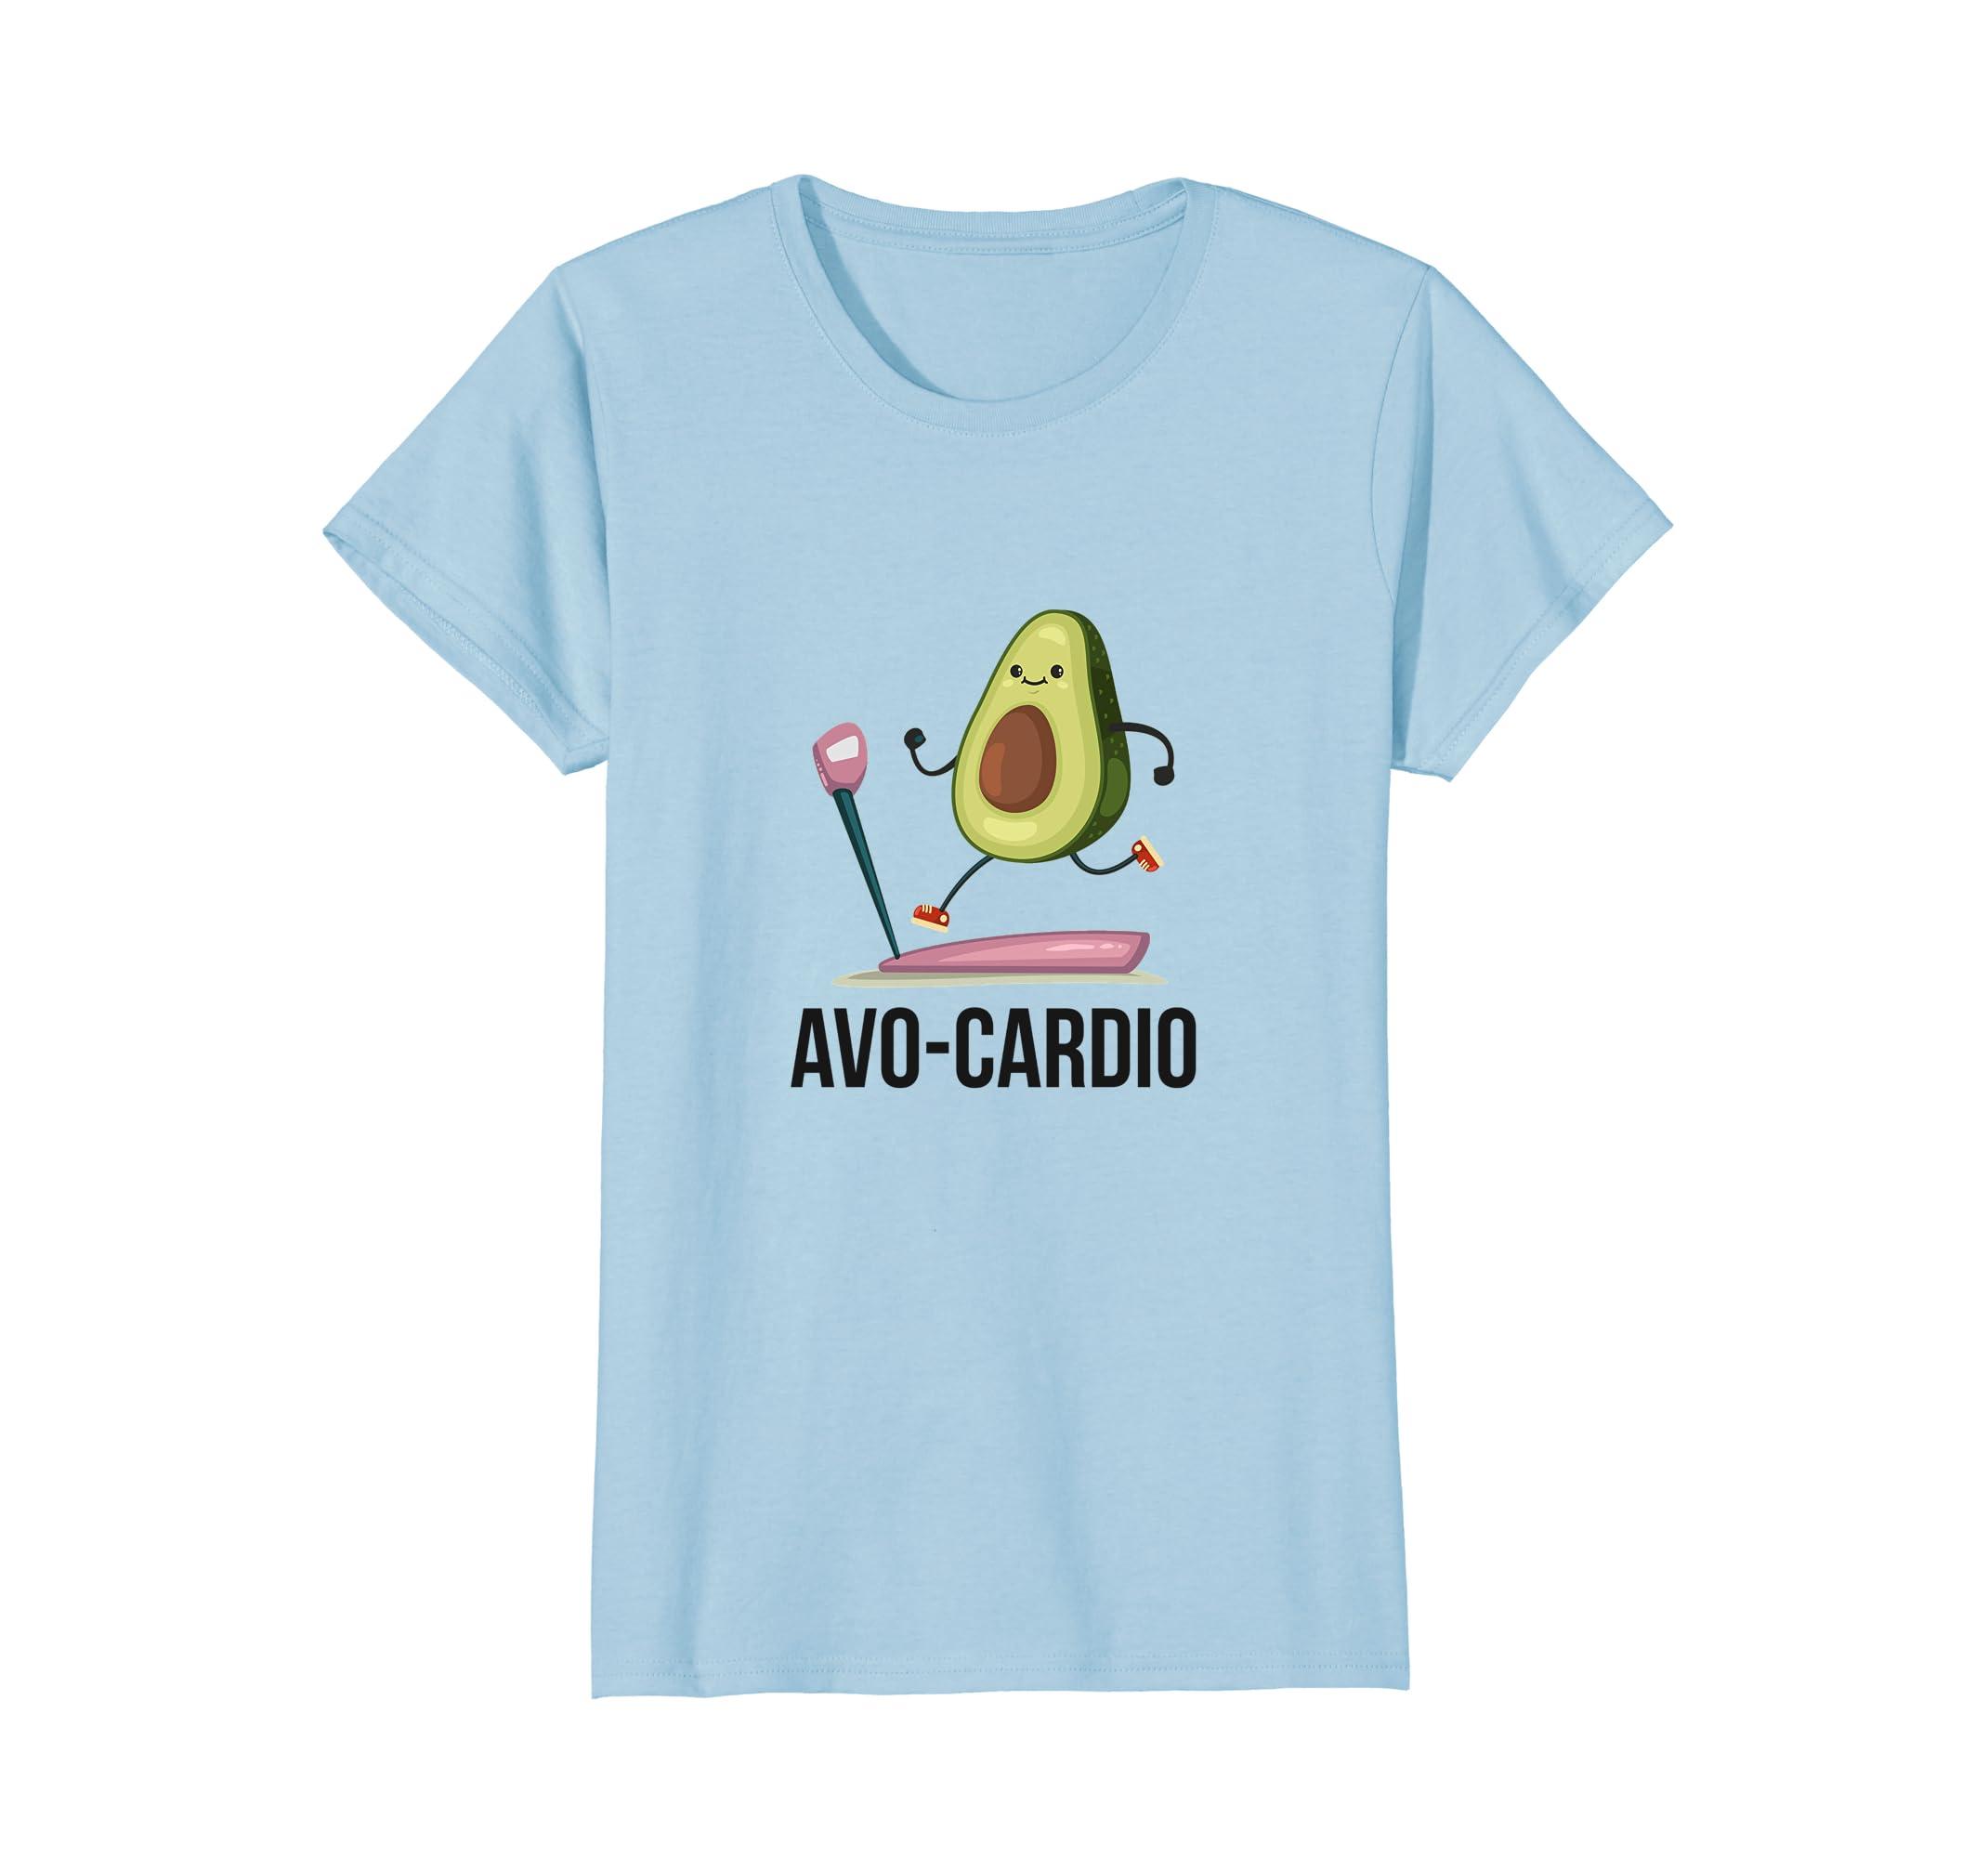 2dac6c1a70 Amazon.com: Avocado Treadmill Running Avo-Cardio Workout Fitness Shirt:  Clothing